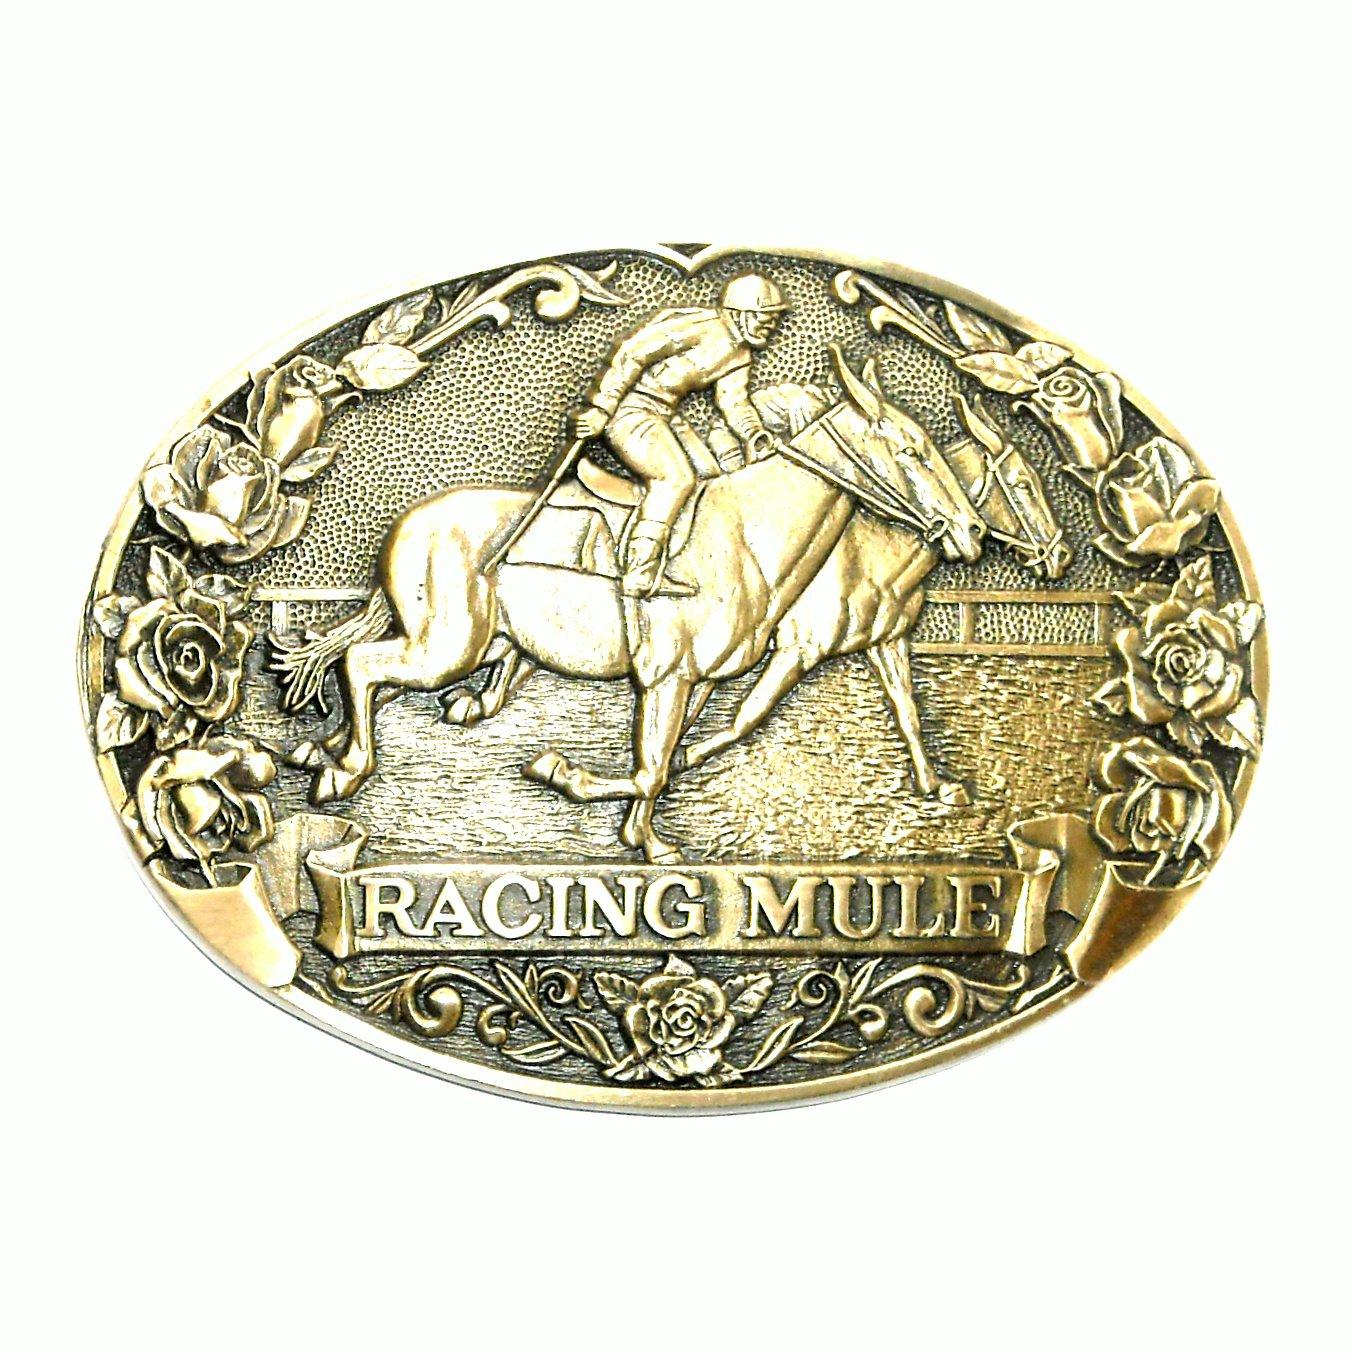 Mule Racing Tony Lama First Edition Vintage Brass Belt Buckle